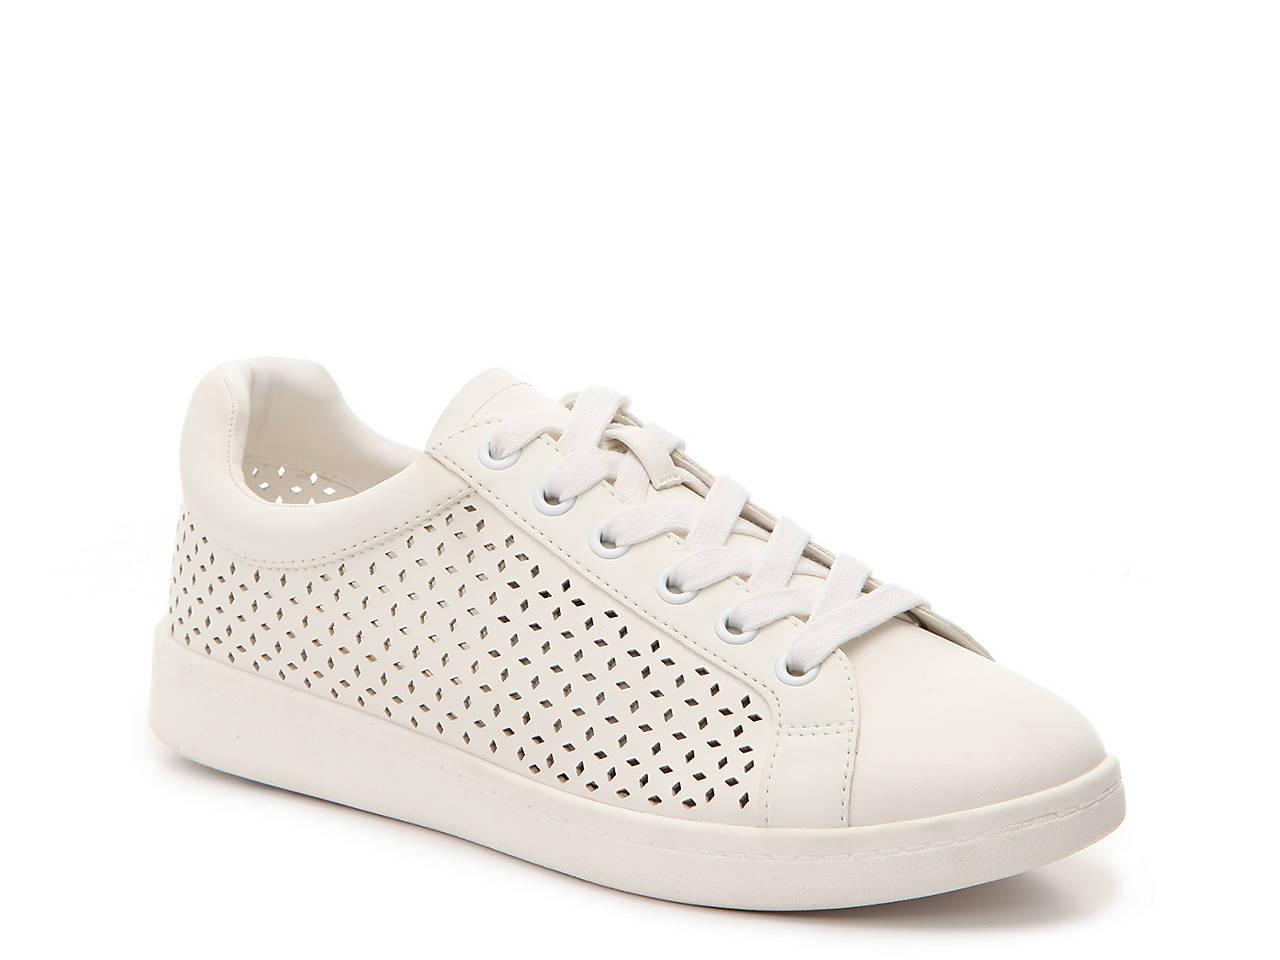 0c463eaebf3c2 Circus by Sam Edelman Carlin Sneaker Women s Shoes